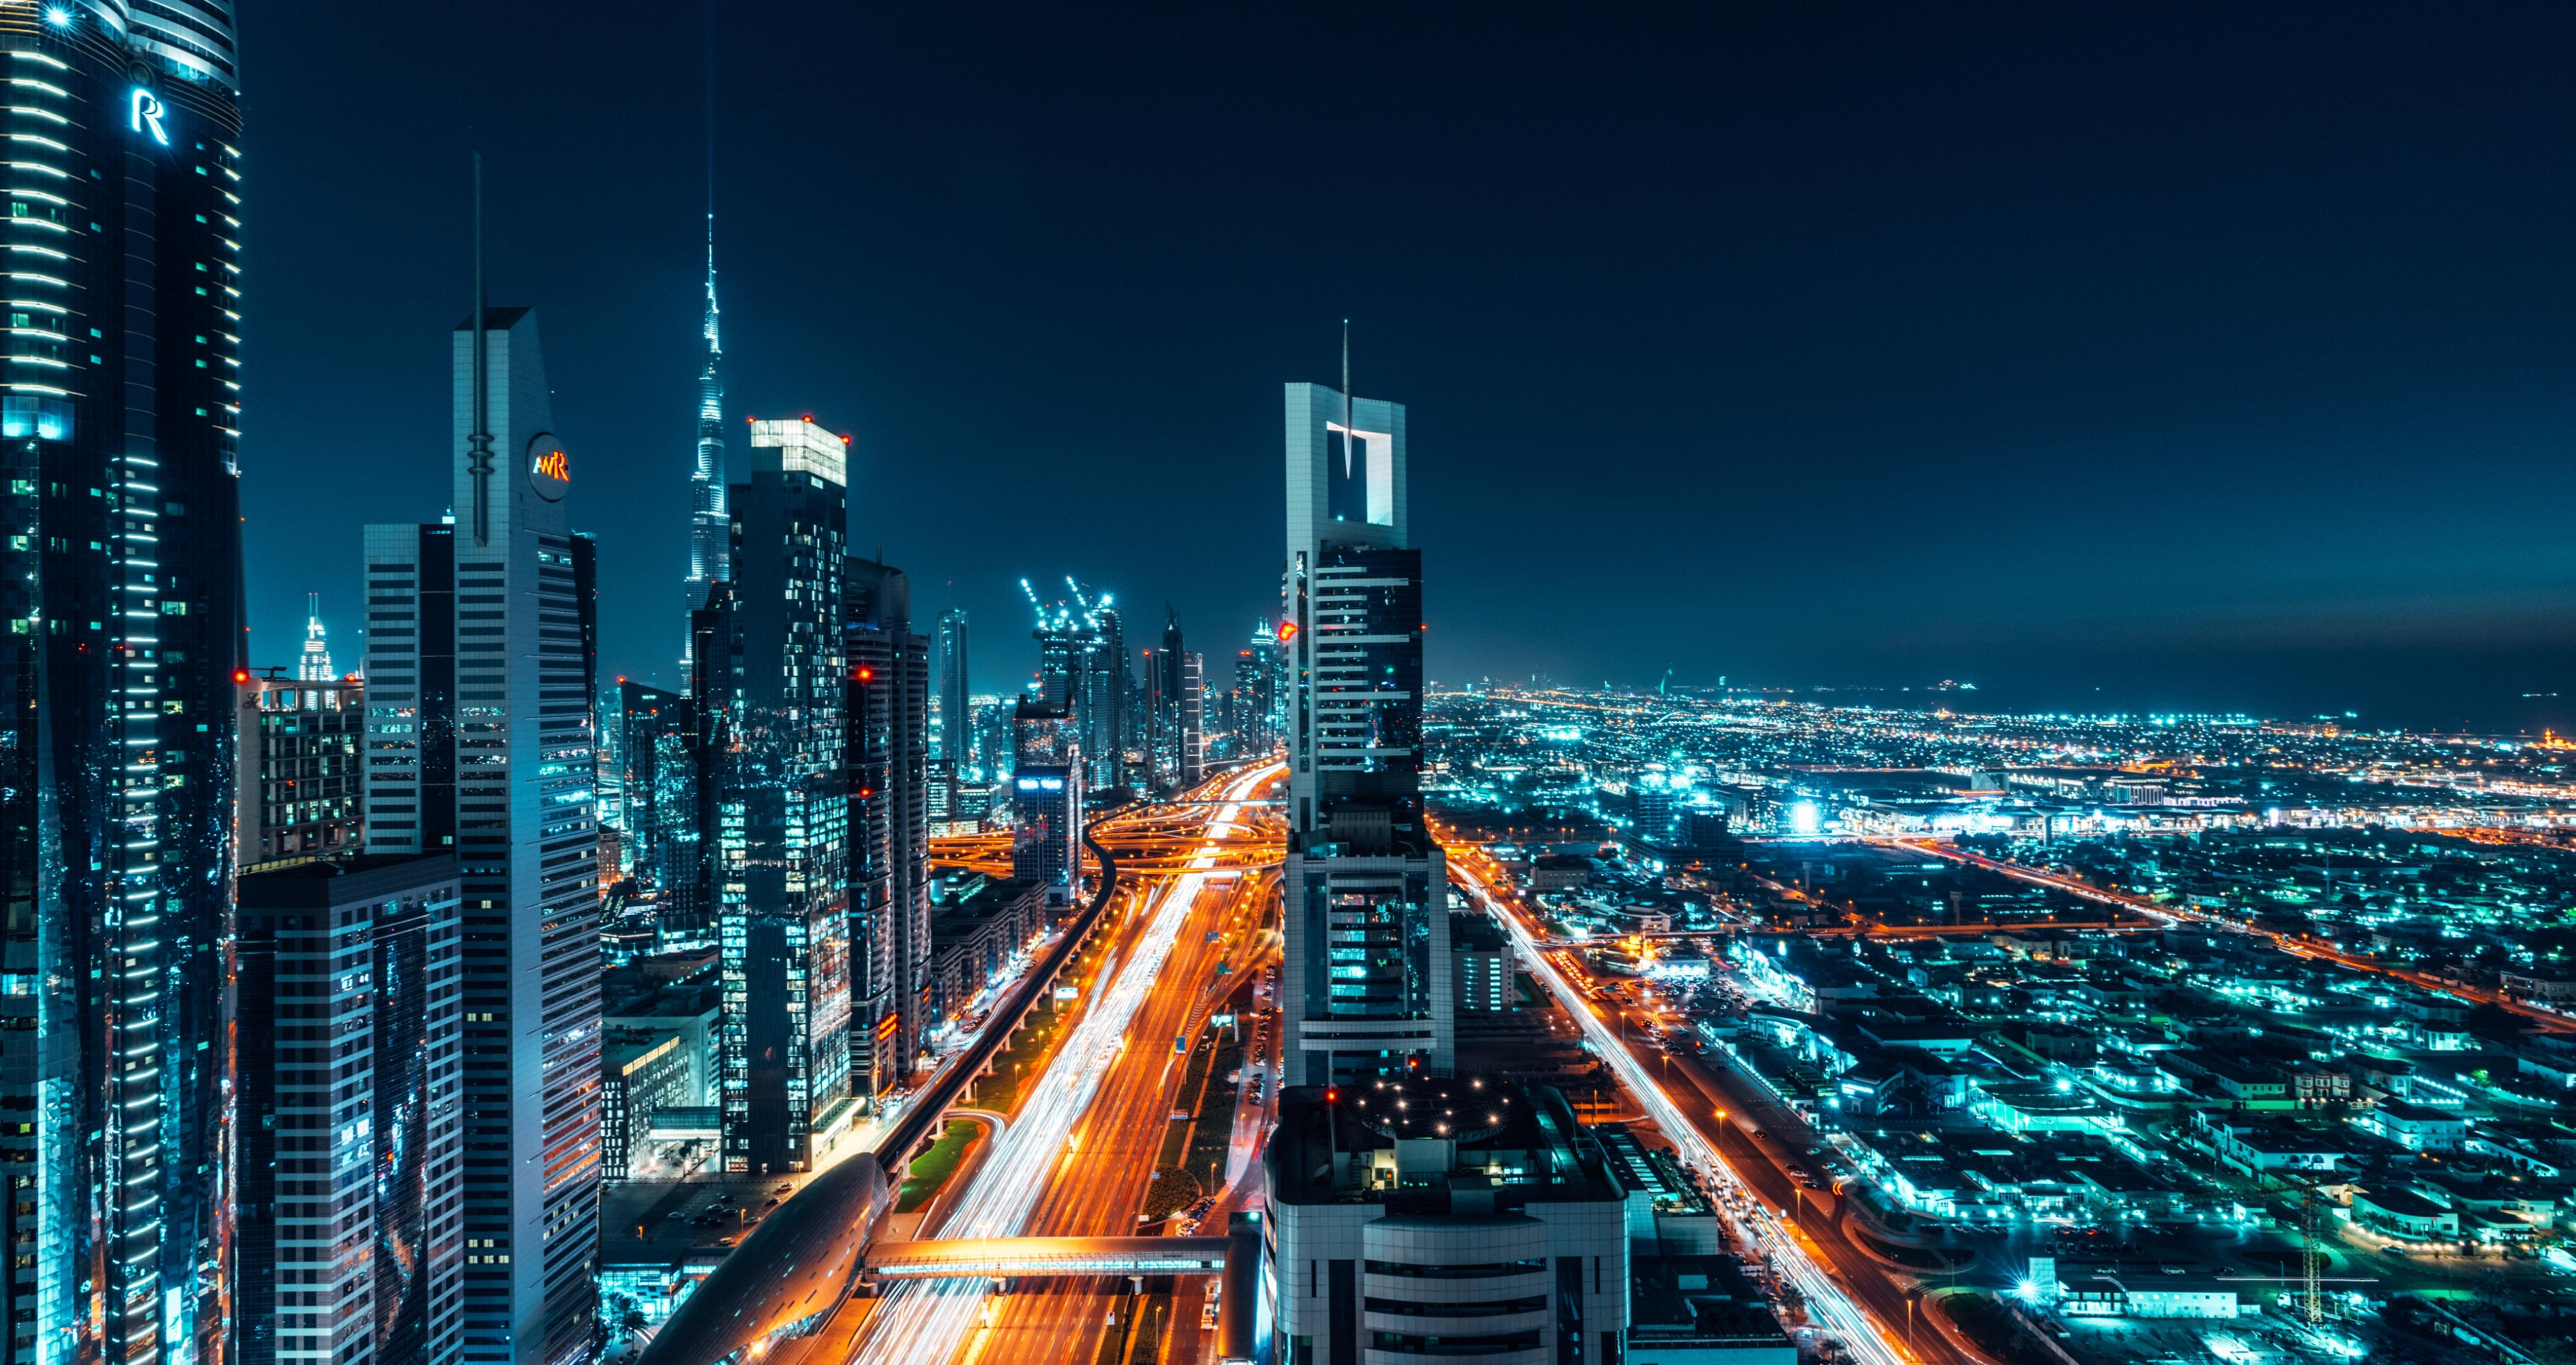 UAE travel: 10 great reasons to visit | CNN Travel